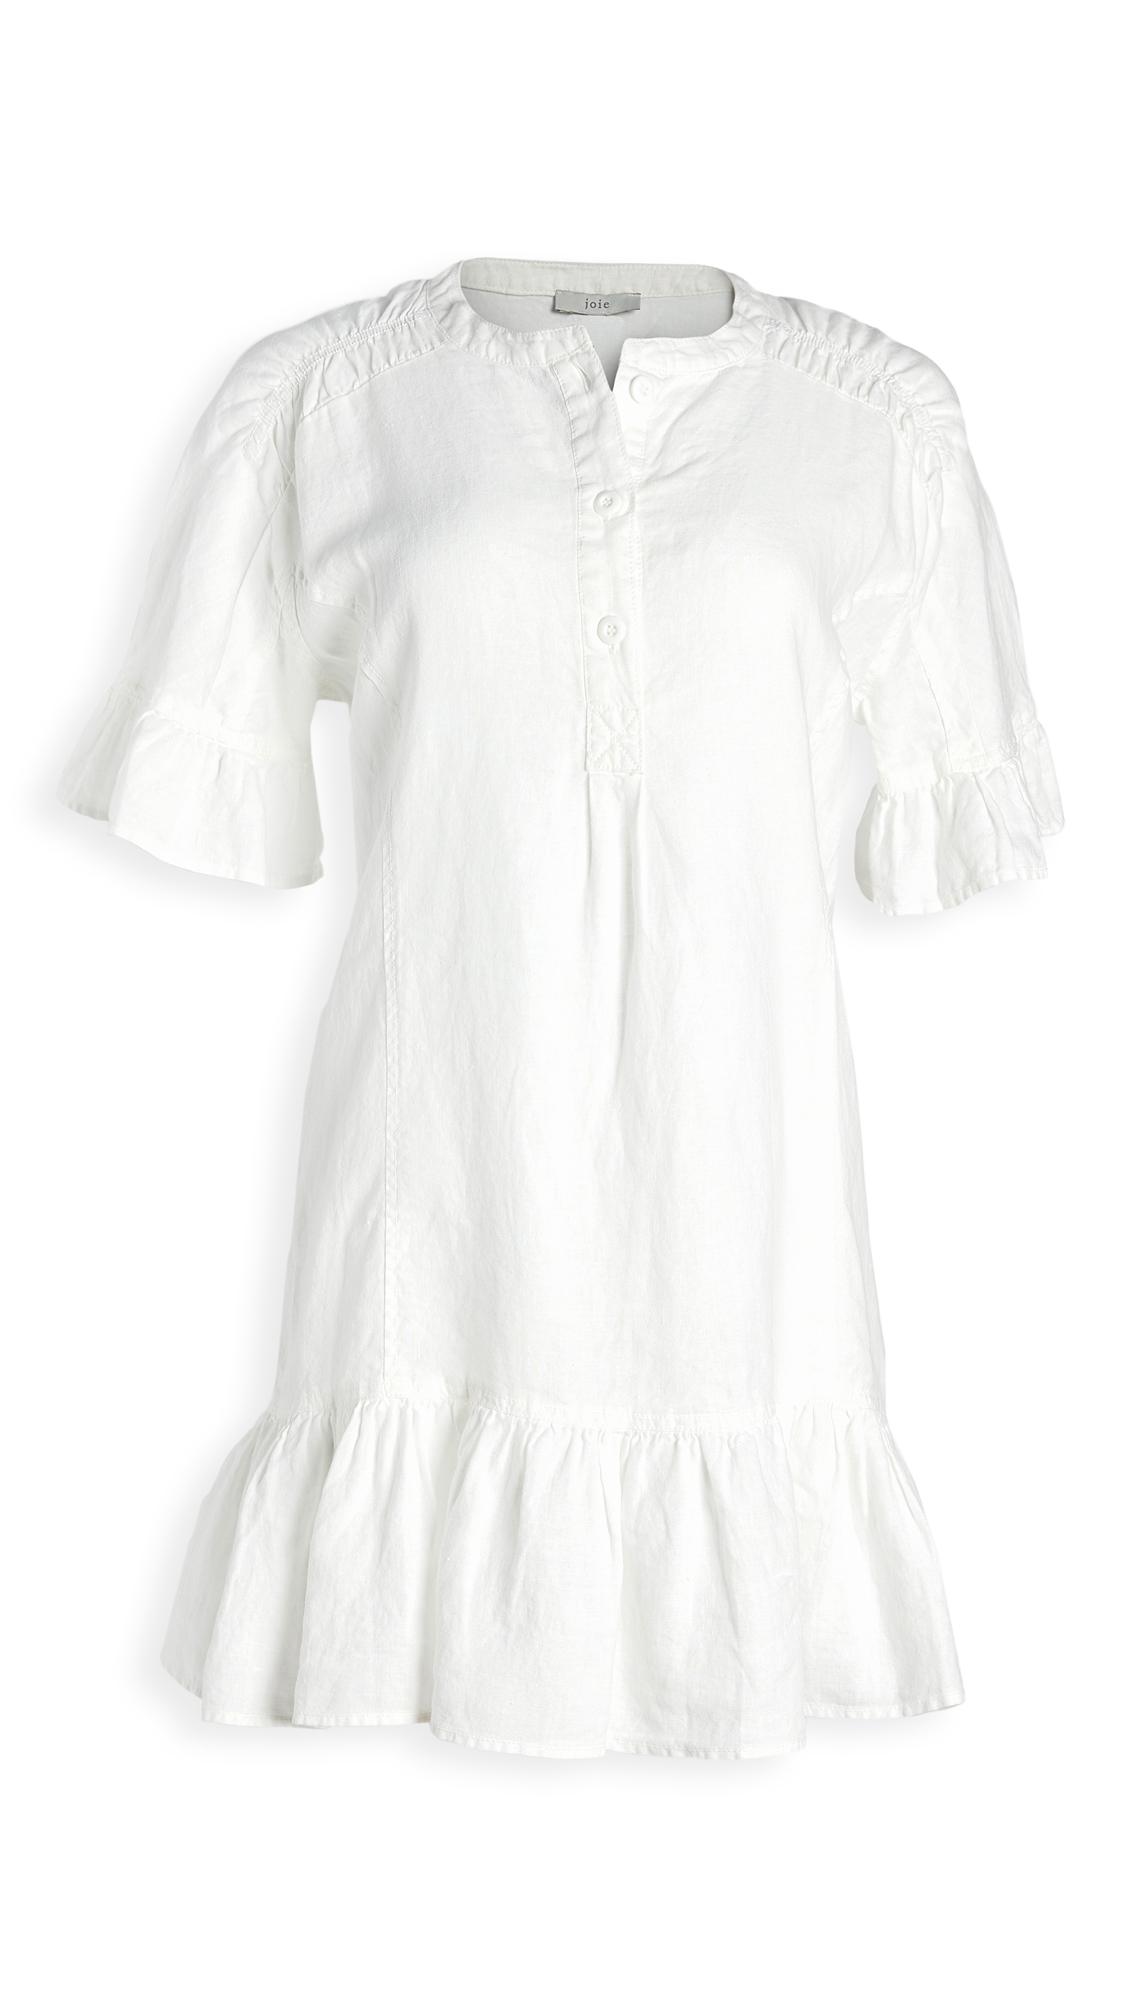 Joie Brandt Dress - 30% Off Sale